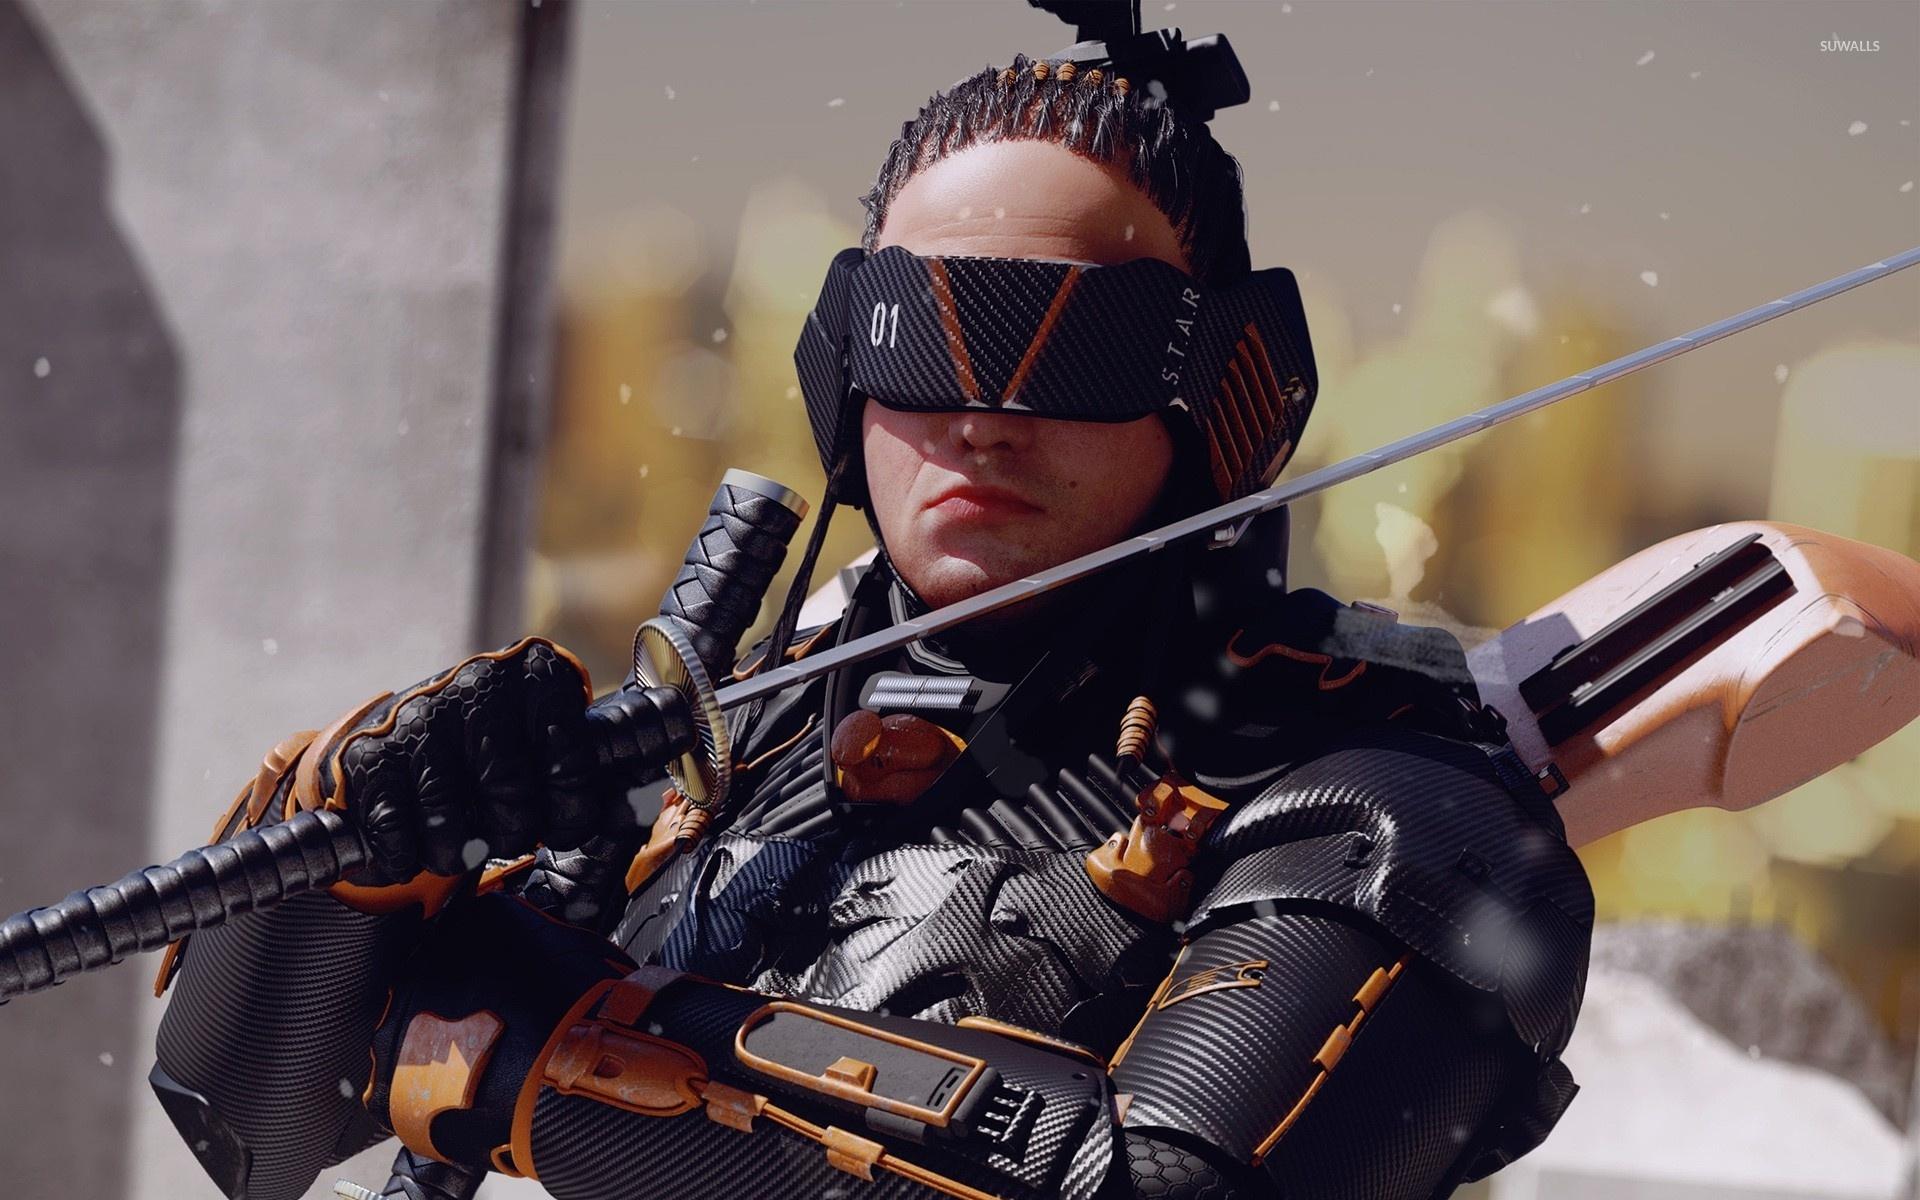 Warrior with swords in Metal Gear Rising: Revengeance wallpaper - Game wallpapers - #53881